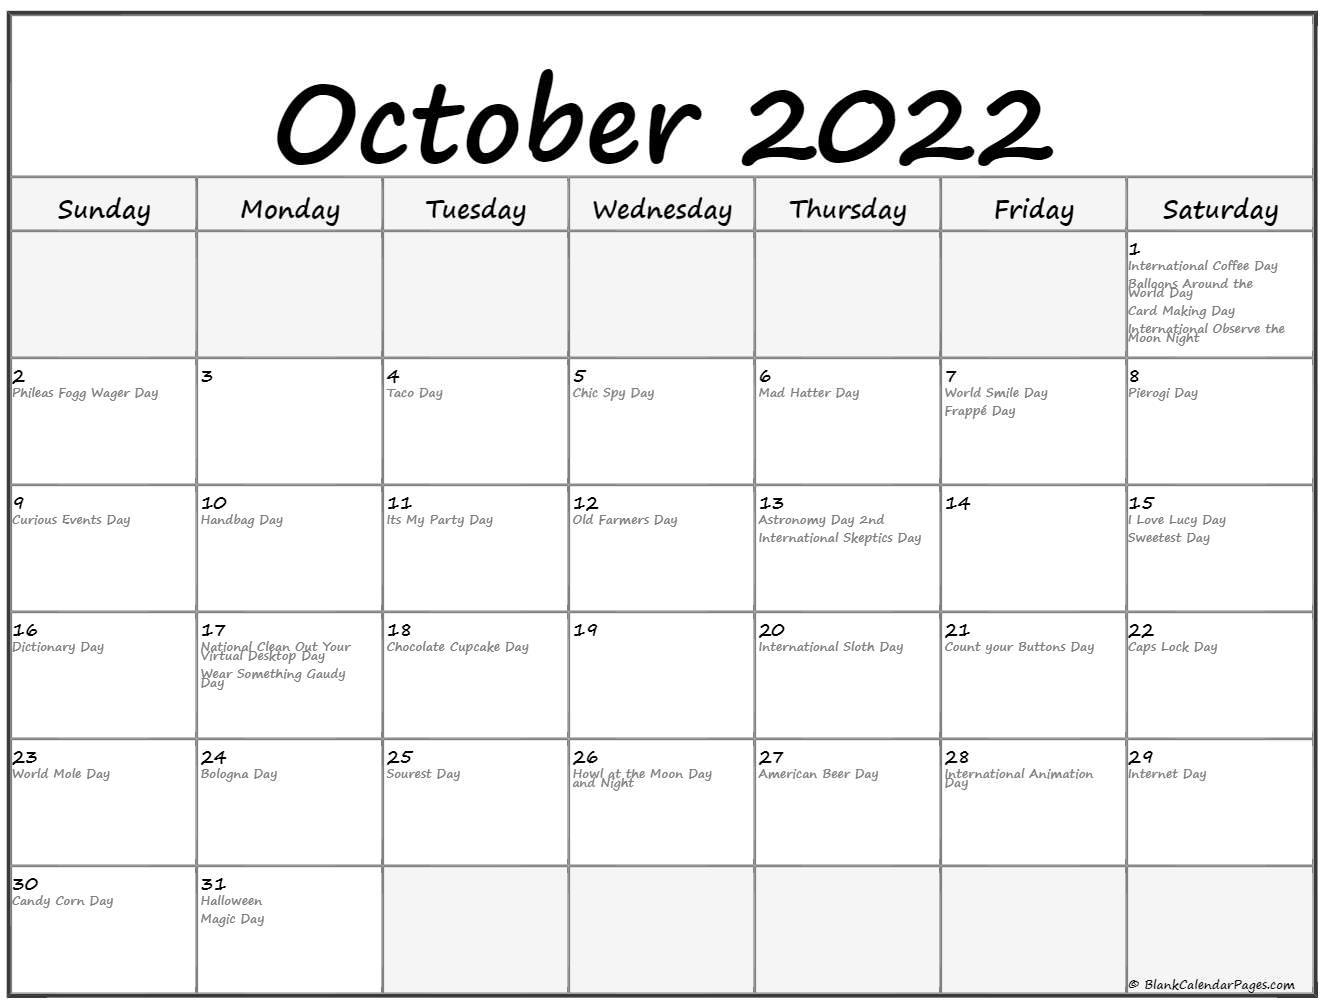 October 2022 calendar with holidays